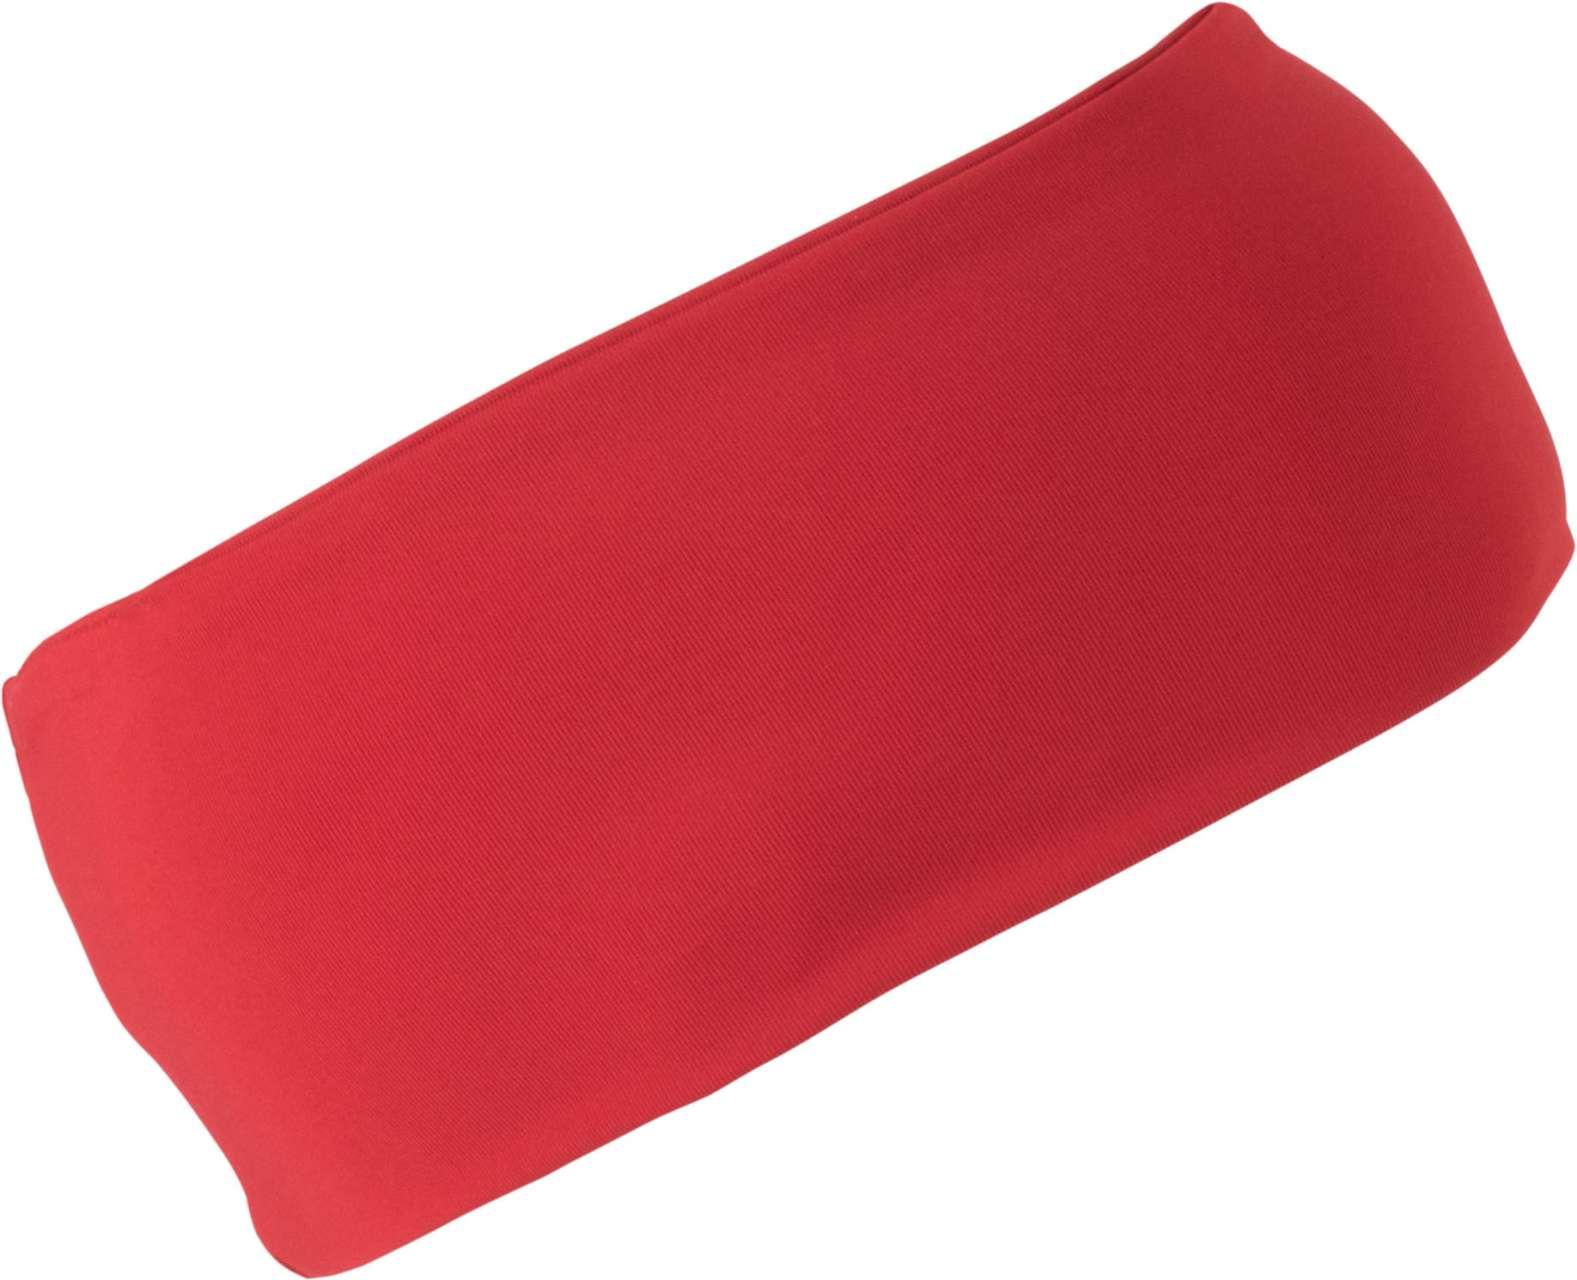 Banda cap sport KP428 rosie Caciuli sepci personalizate fulare manusi acryl bumbac poliester fleece polar reglabil catarama termotransfer serigrafie broderie